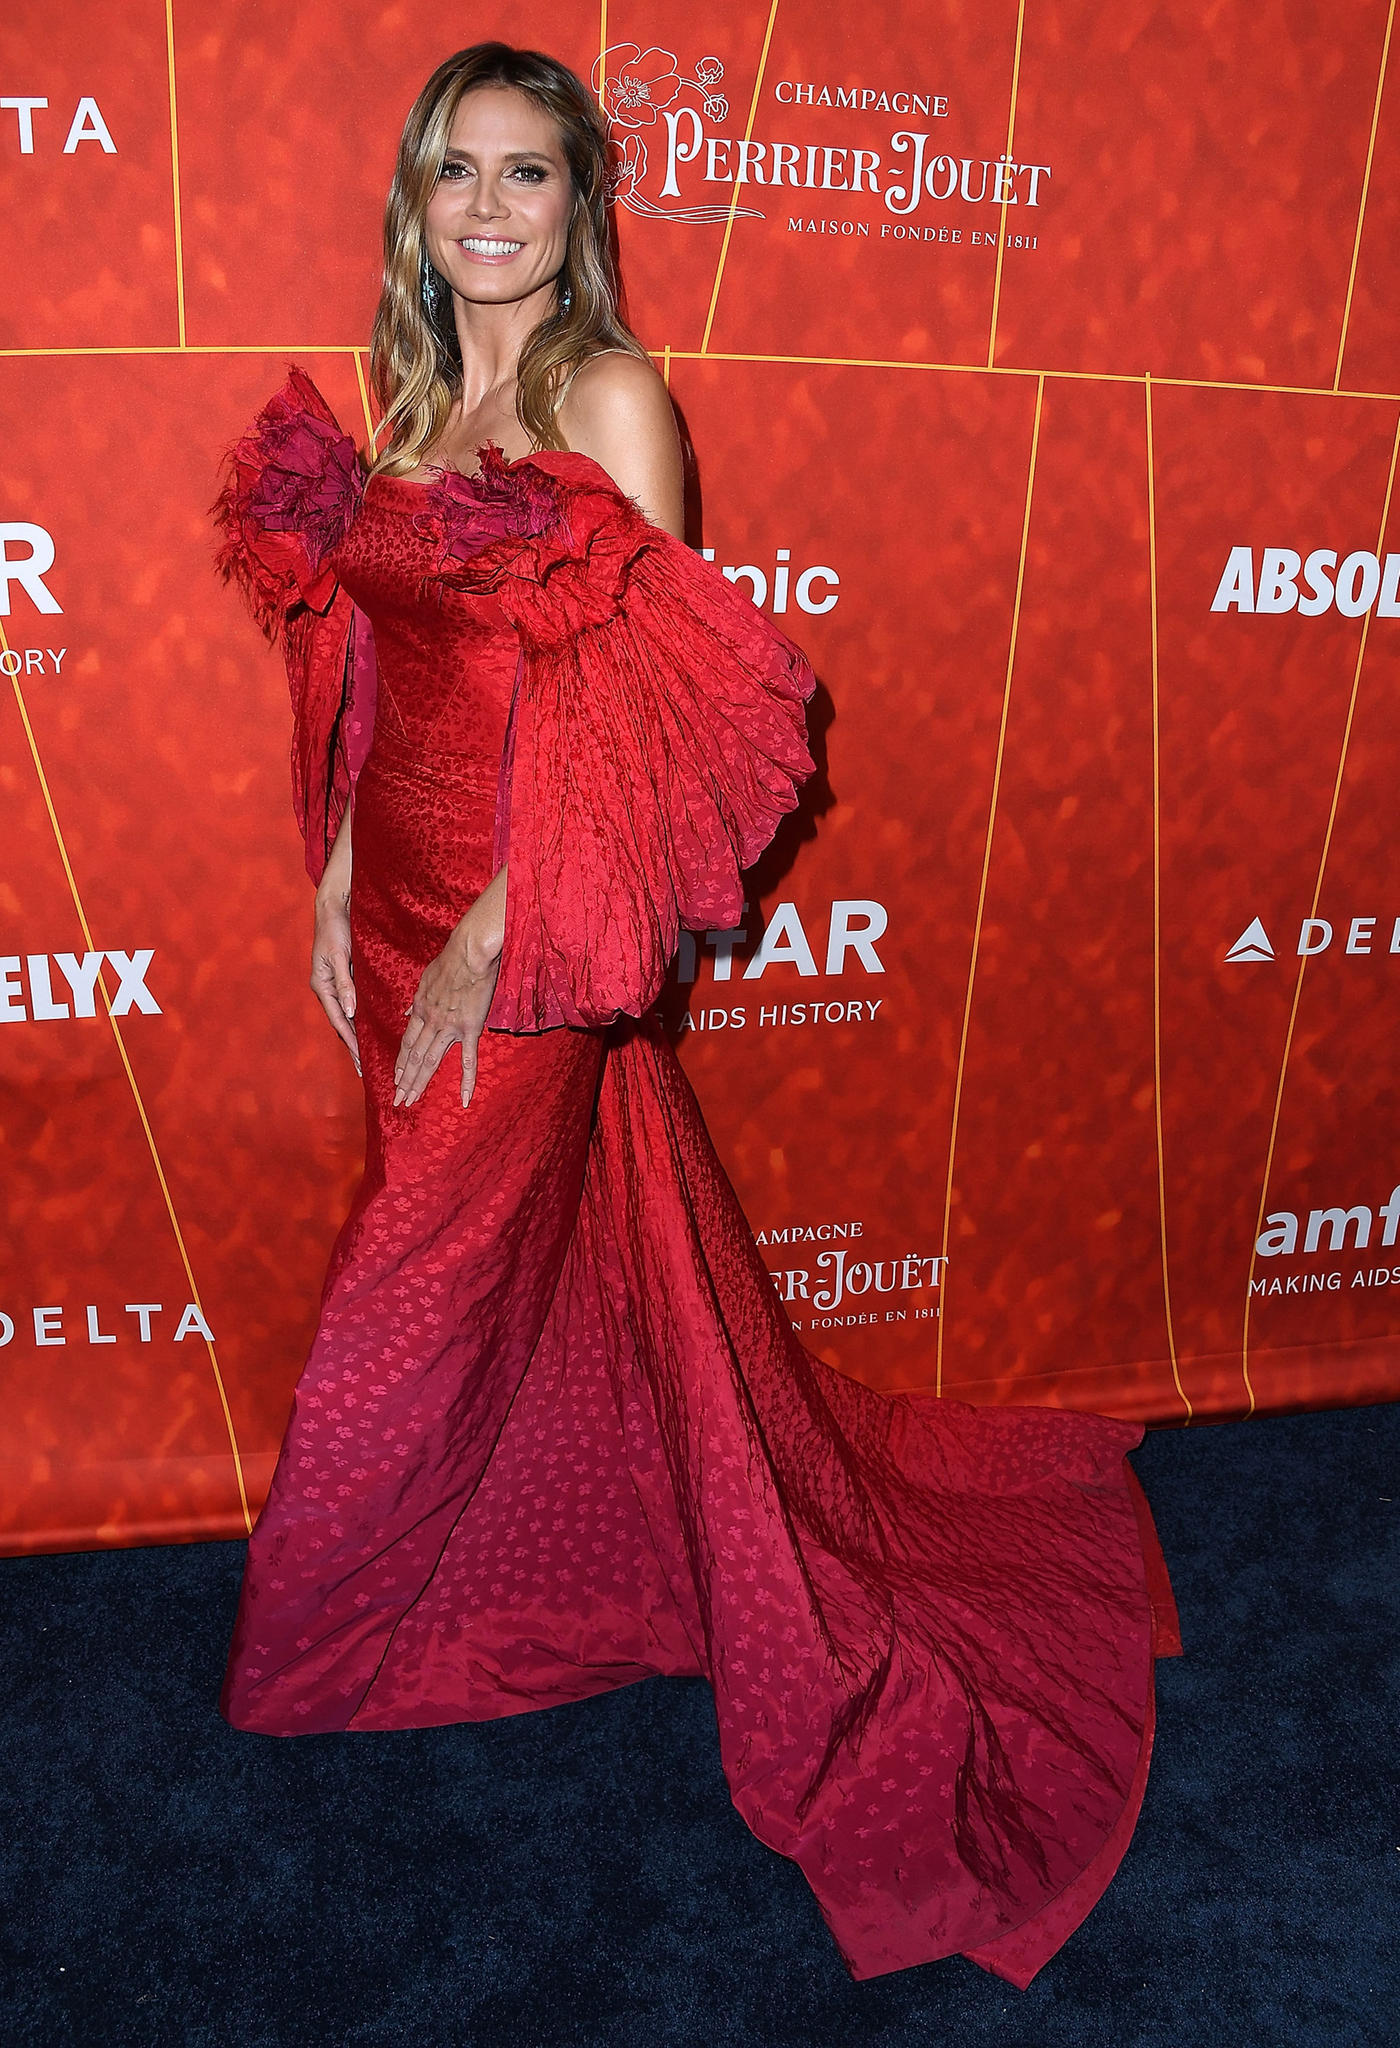 Fashion-Looks-Heidi-wei-wie-der-perfekte-Red-Carpet-Look-funktioniert